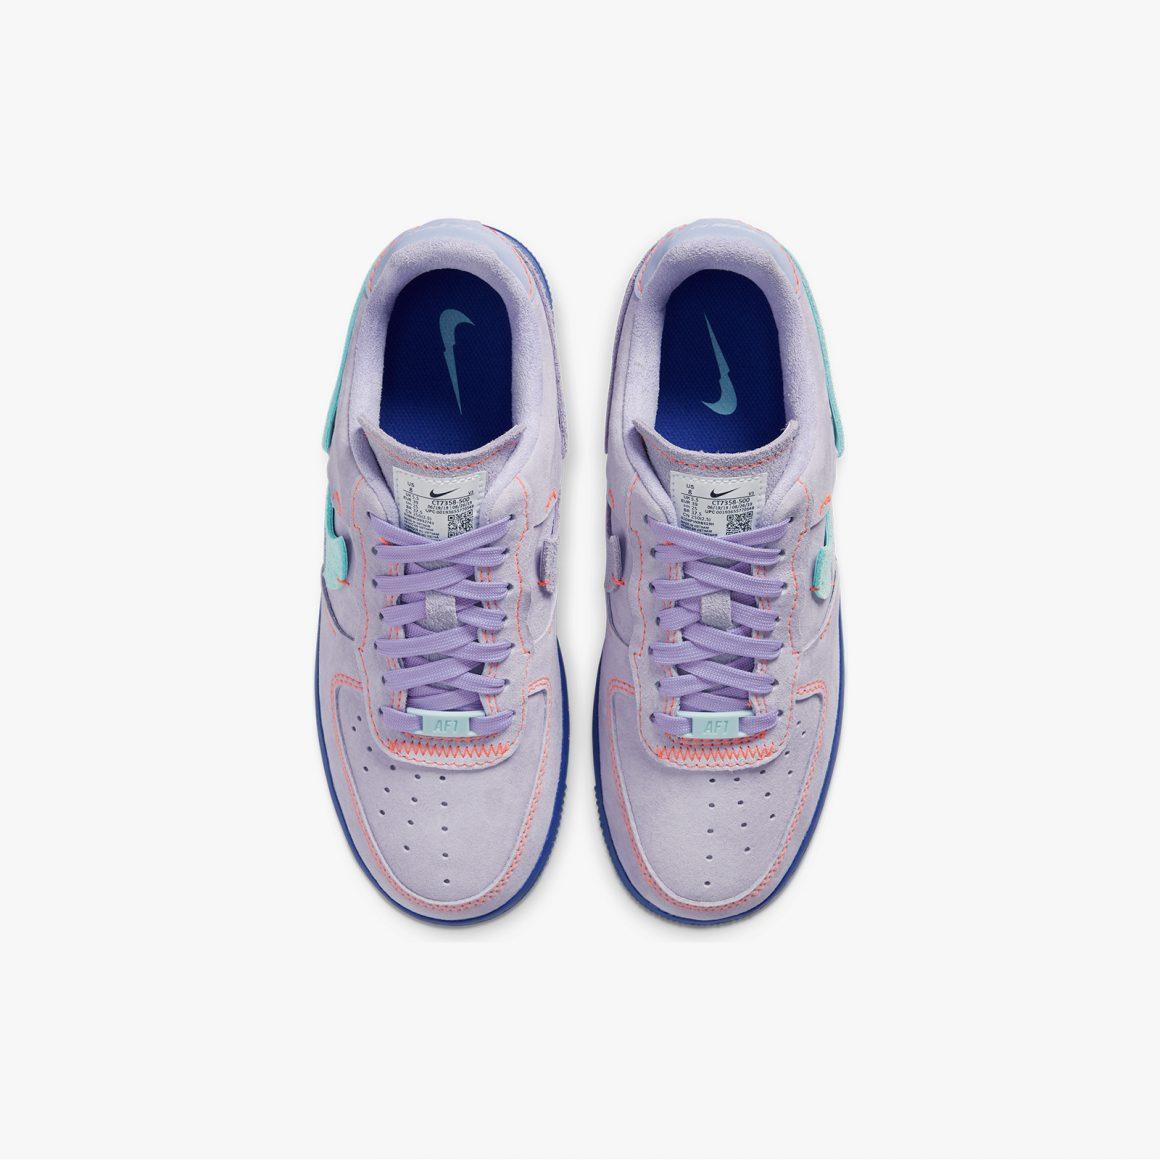 Nike WMNS Air Force 1 '07 LX ''Purple Agate''